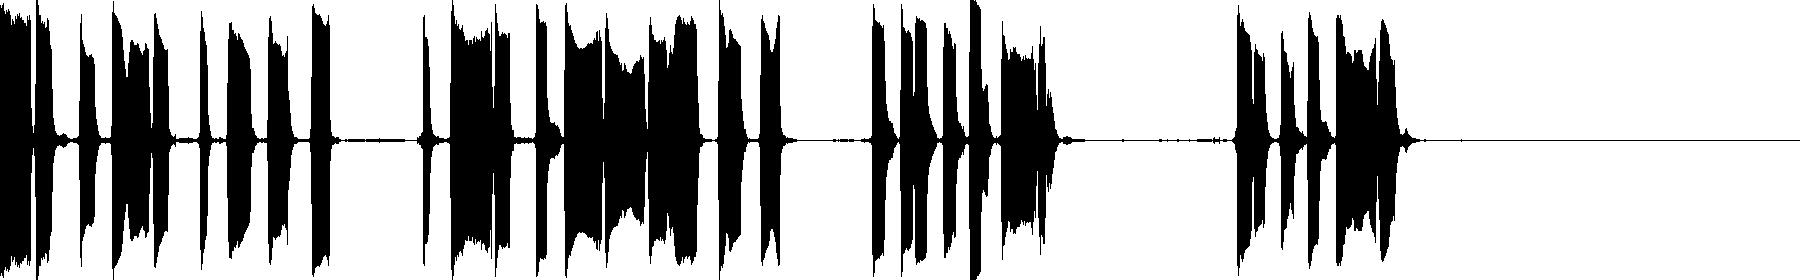 vedh sax lick 06 cm 124bpm